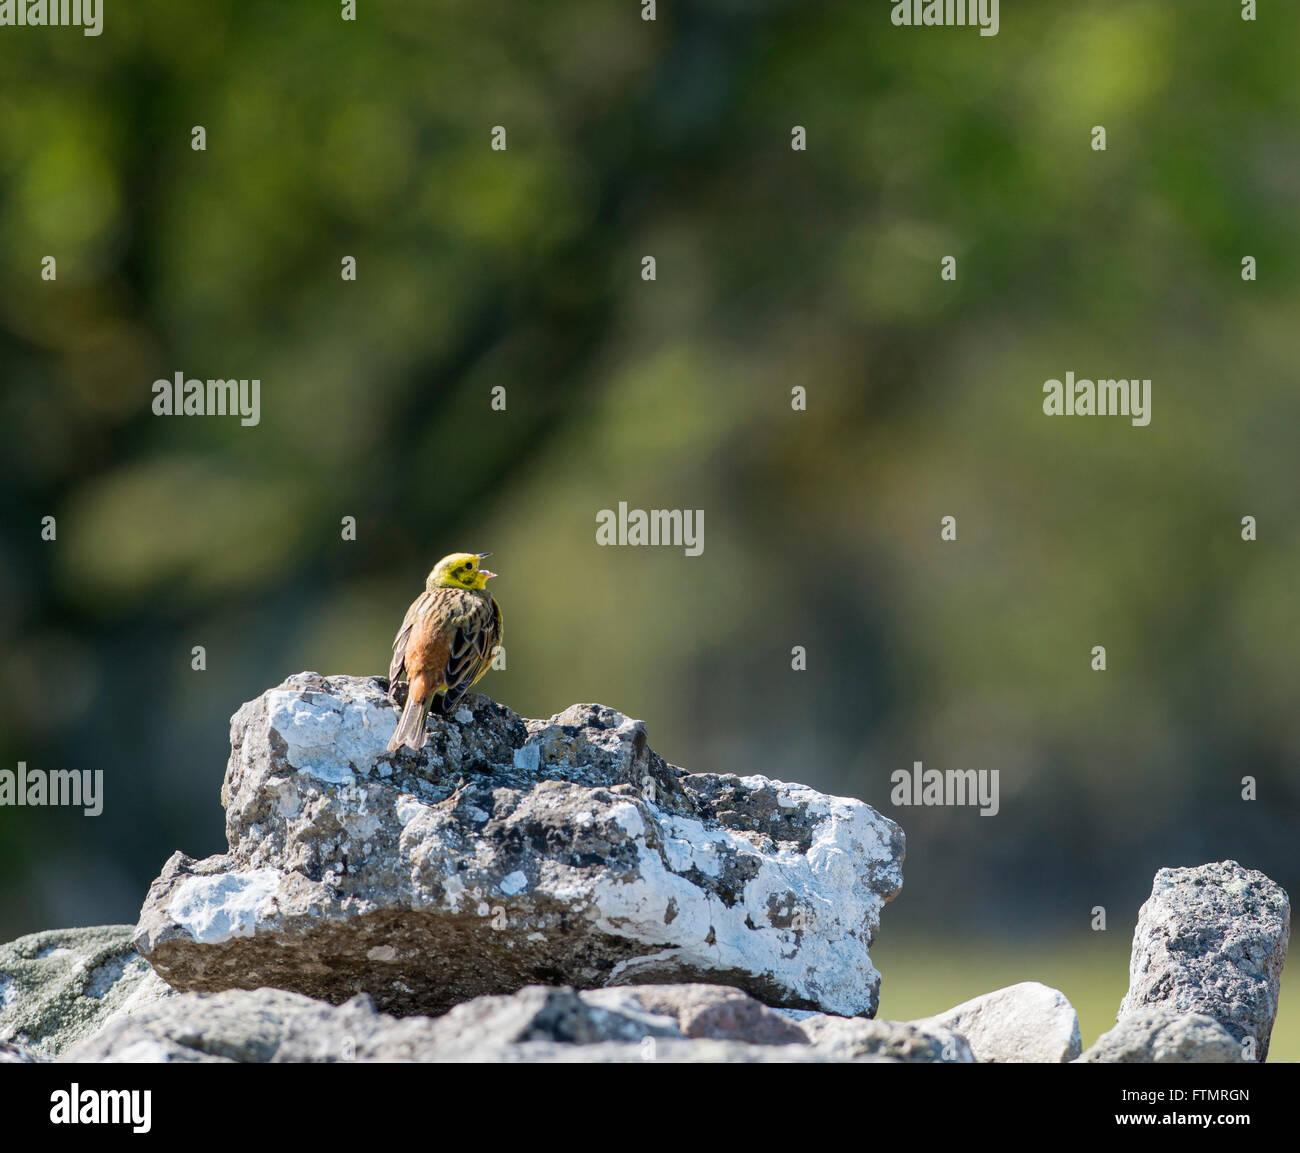 Yellowhammer (Emberiza citrinella) - Stock Image